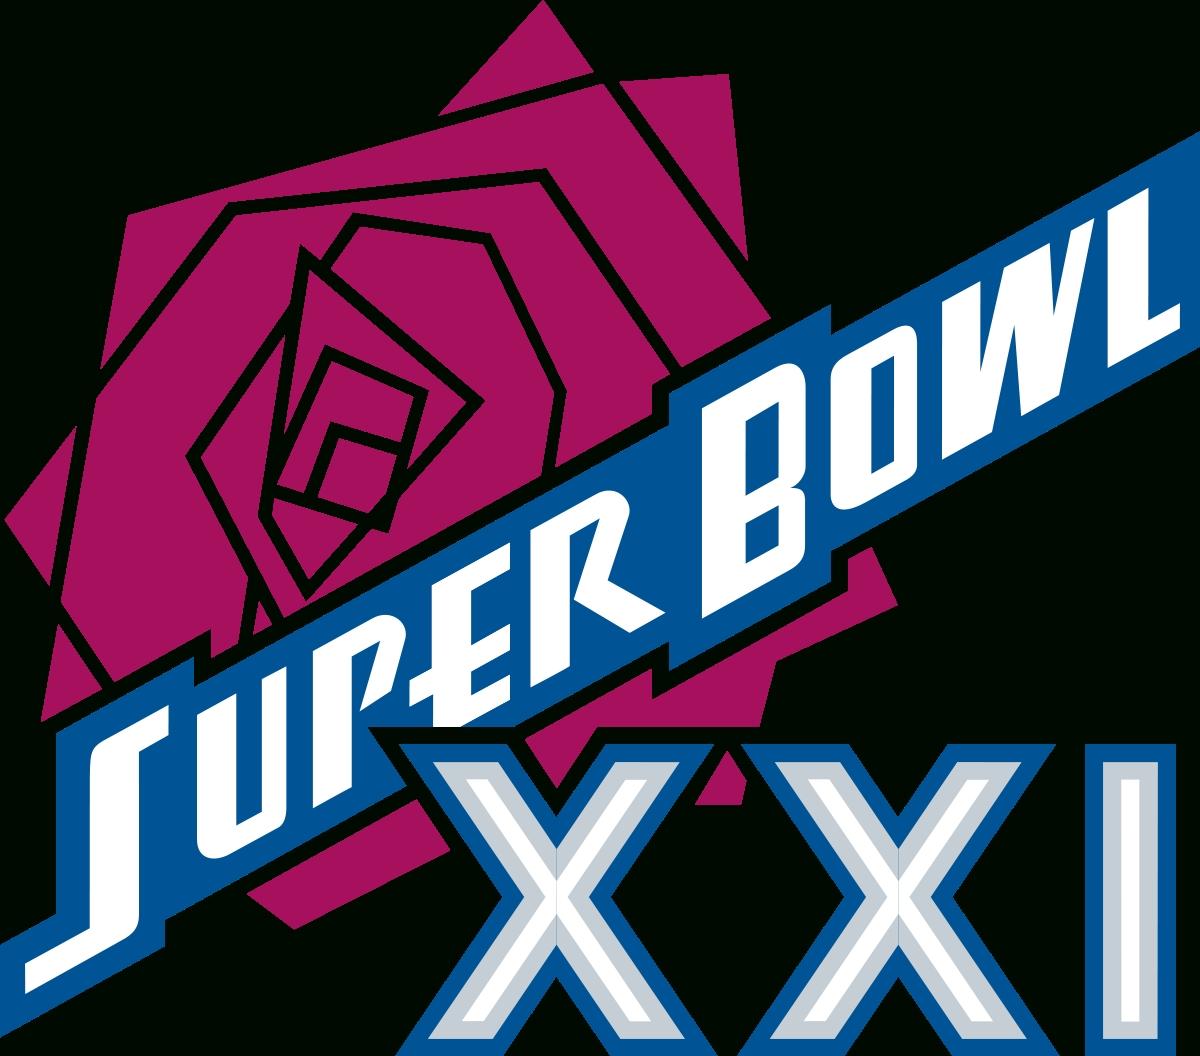 Super Bowl Xxi - Wikipedia throughout New York Giants Nfl Championships 1987